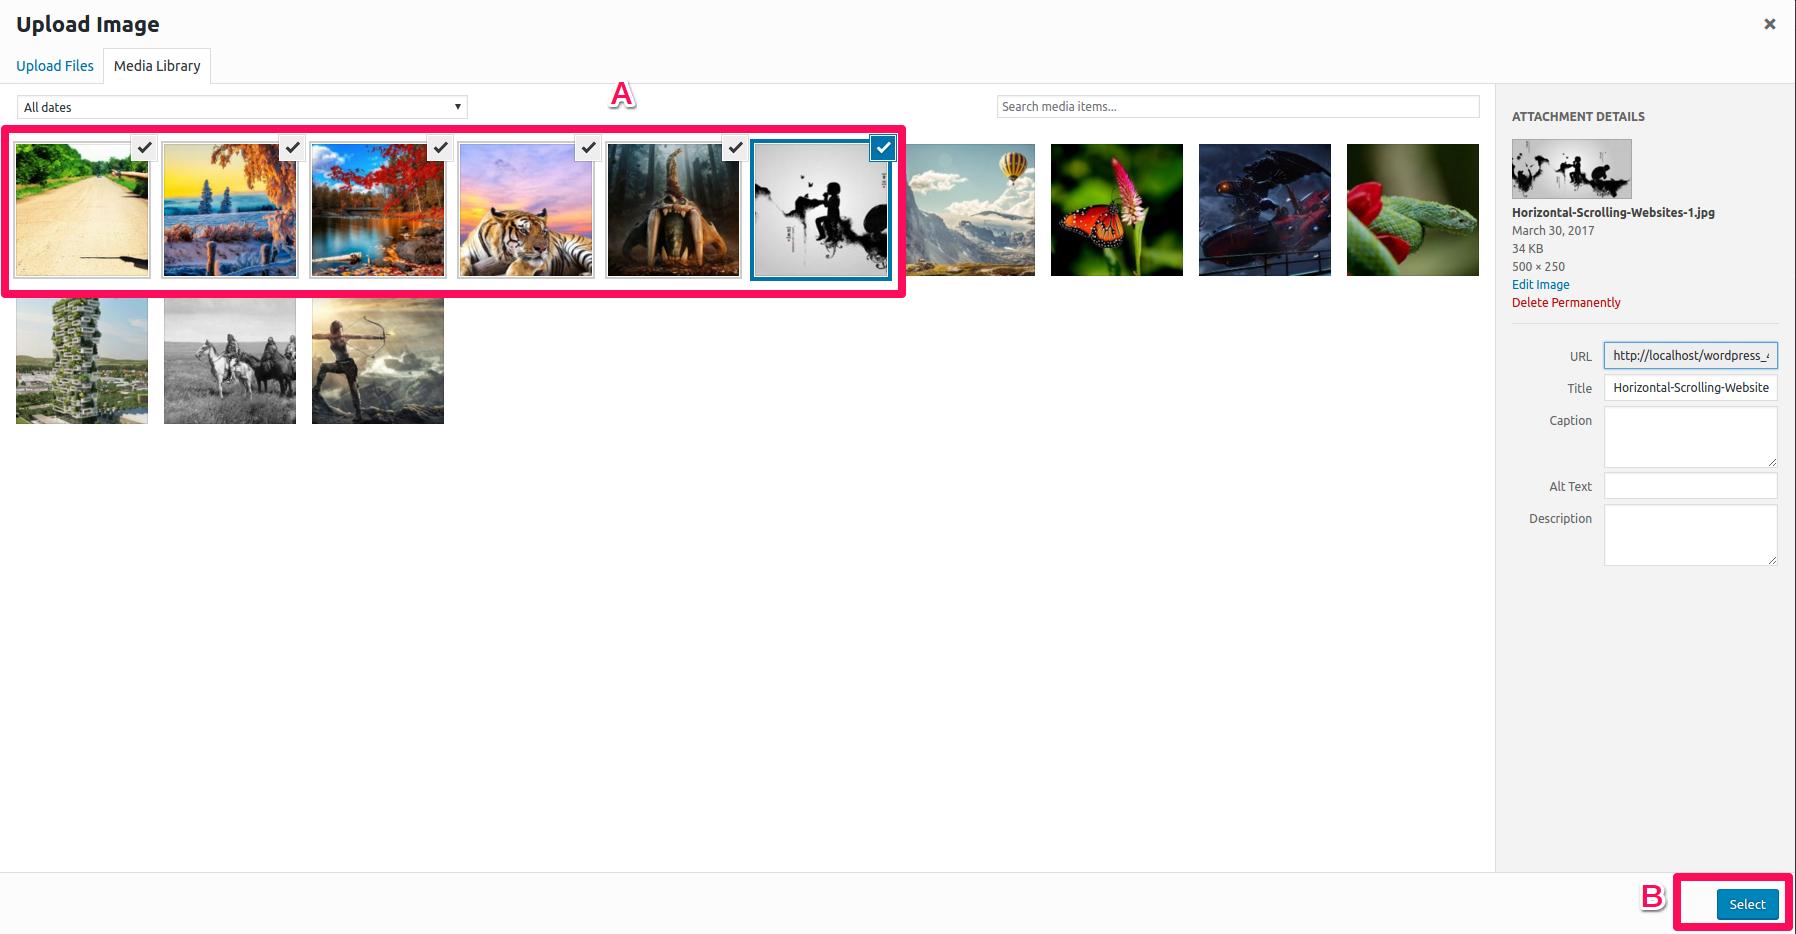 multi_select_image